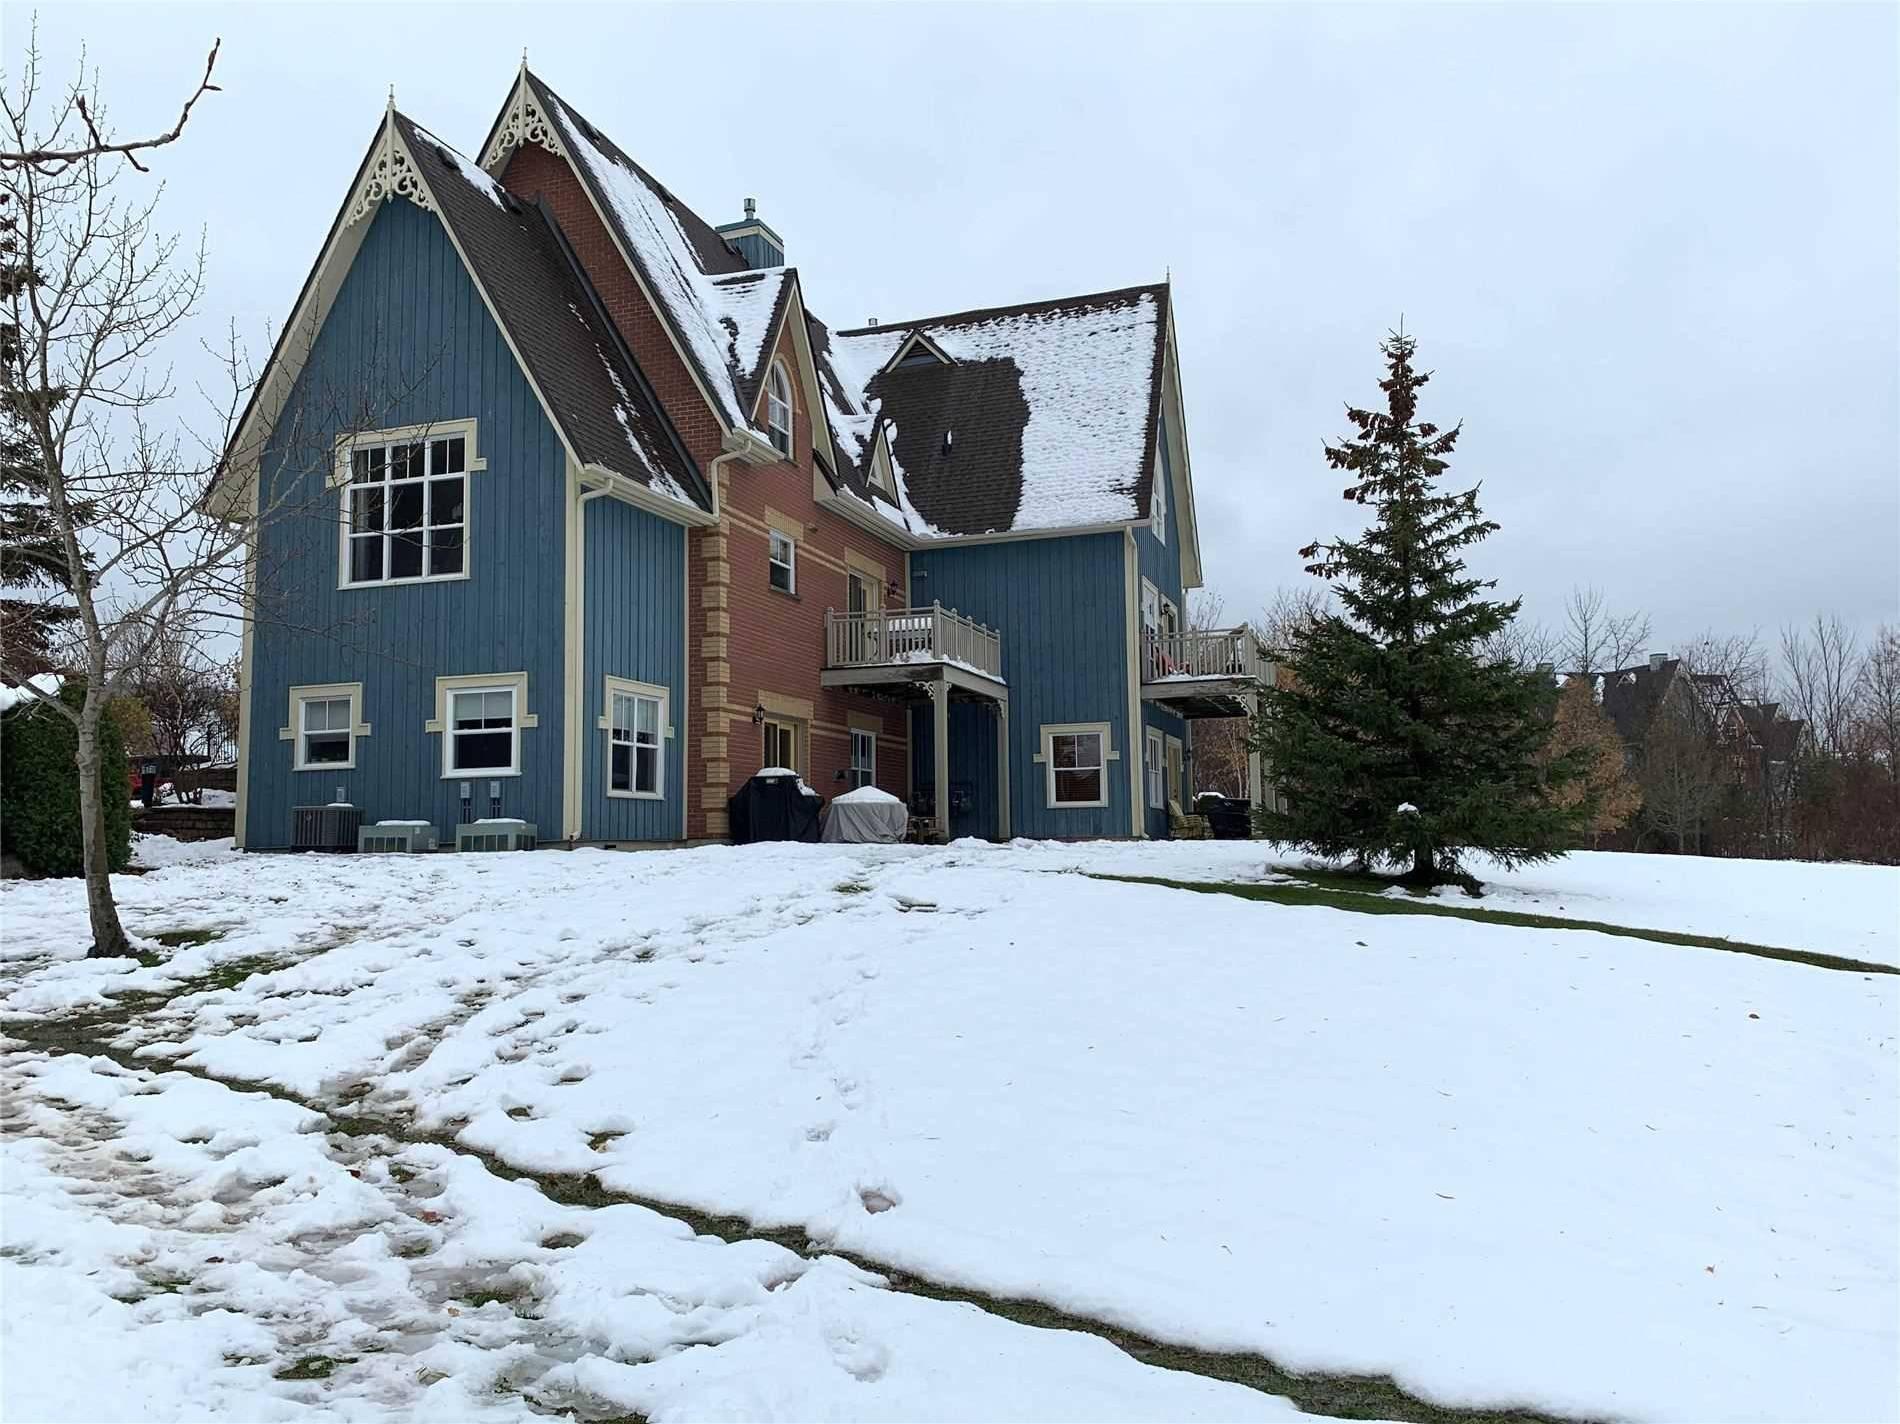 Buliding: 184 Snowbridge Way, Blue Mountains, ON